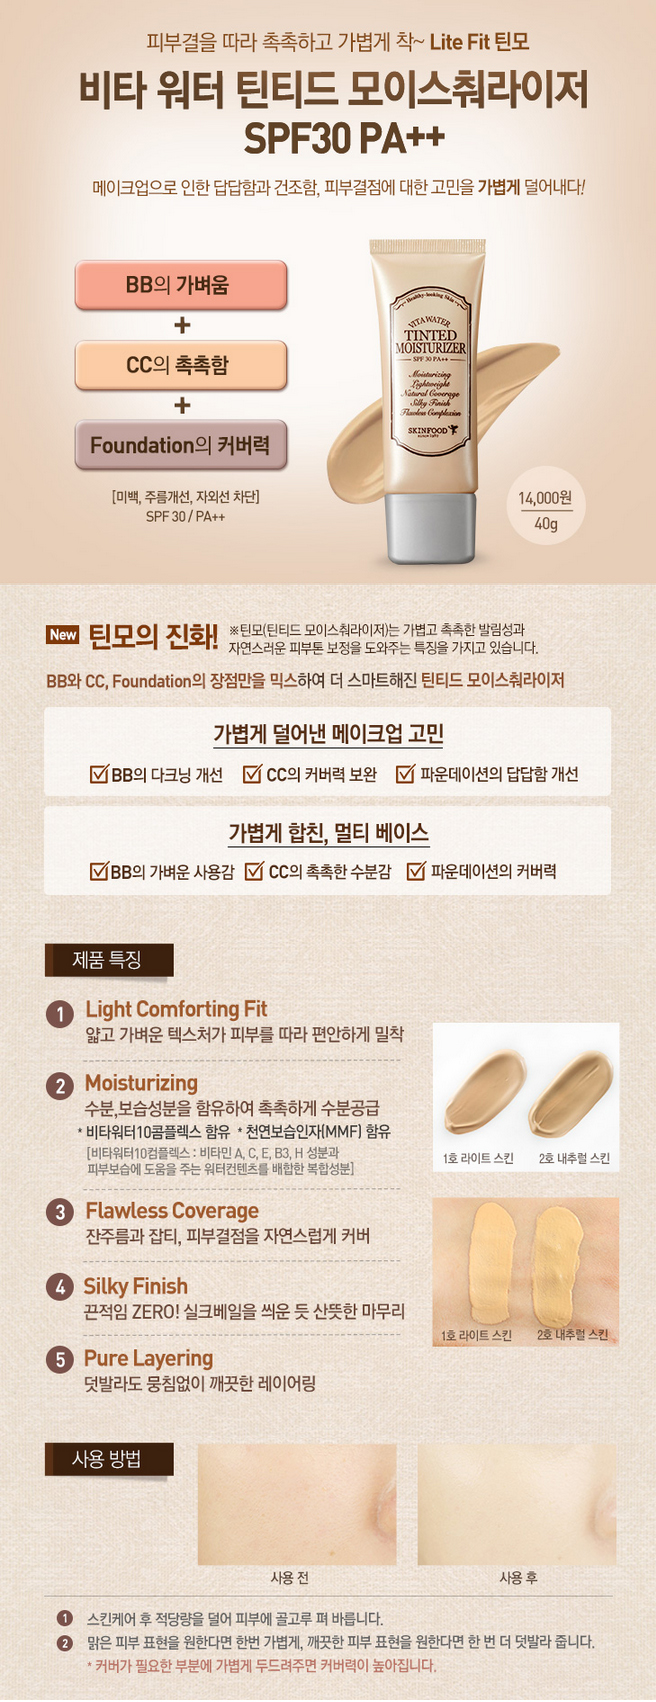 Credit: Skinfood Korea website